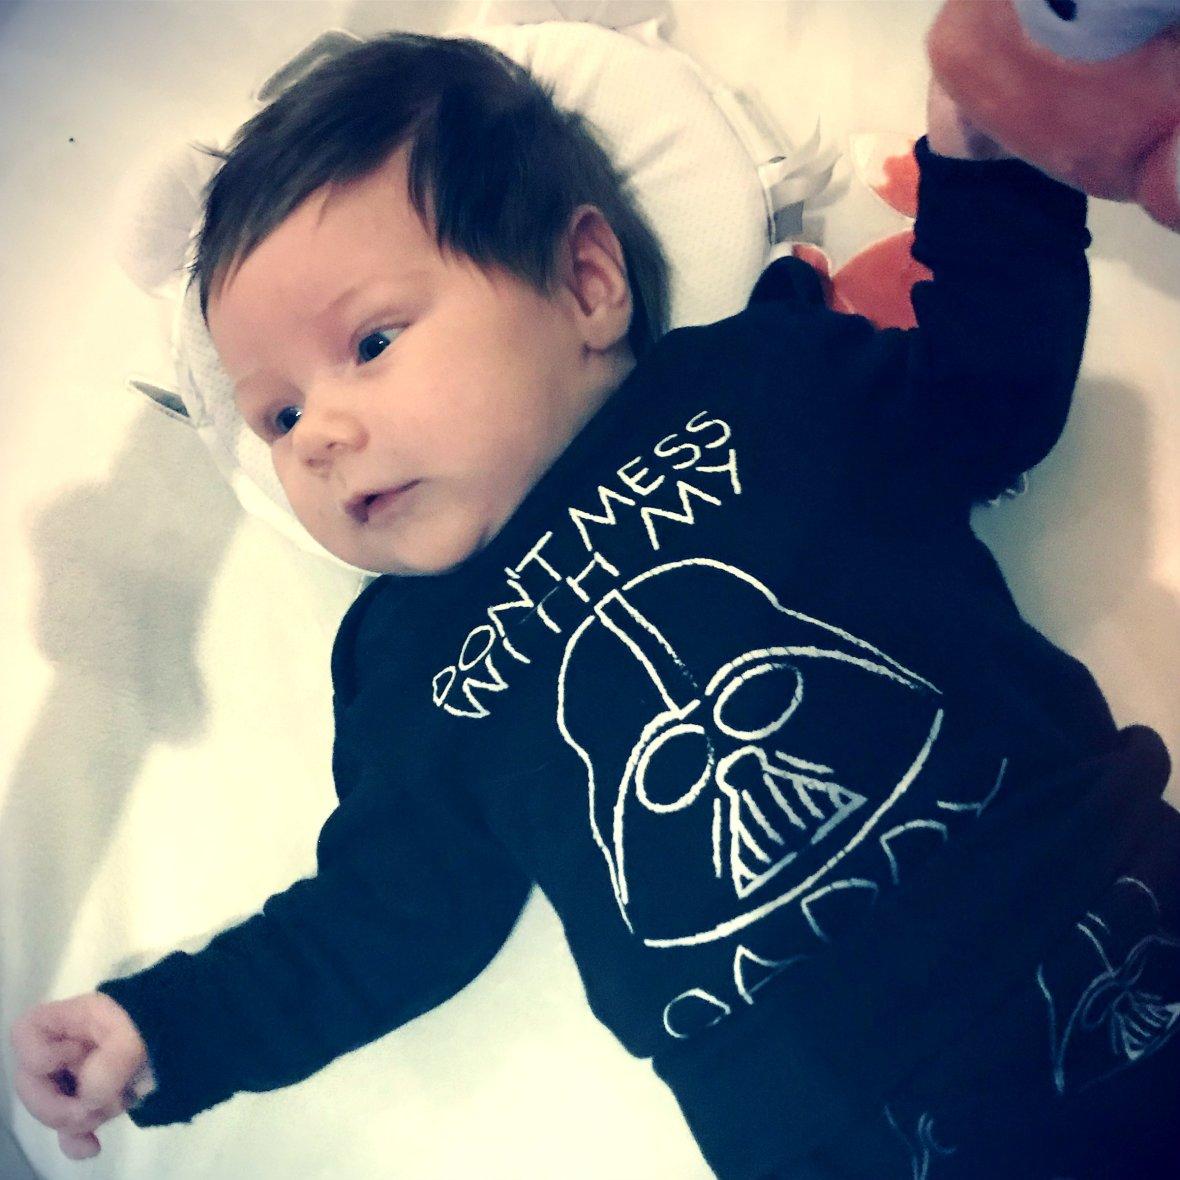 Star Wars Baby